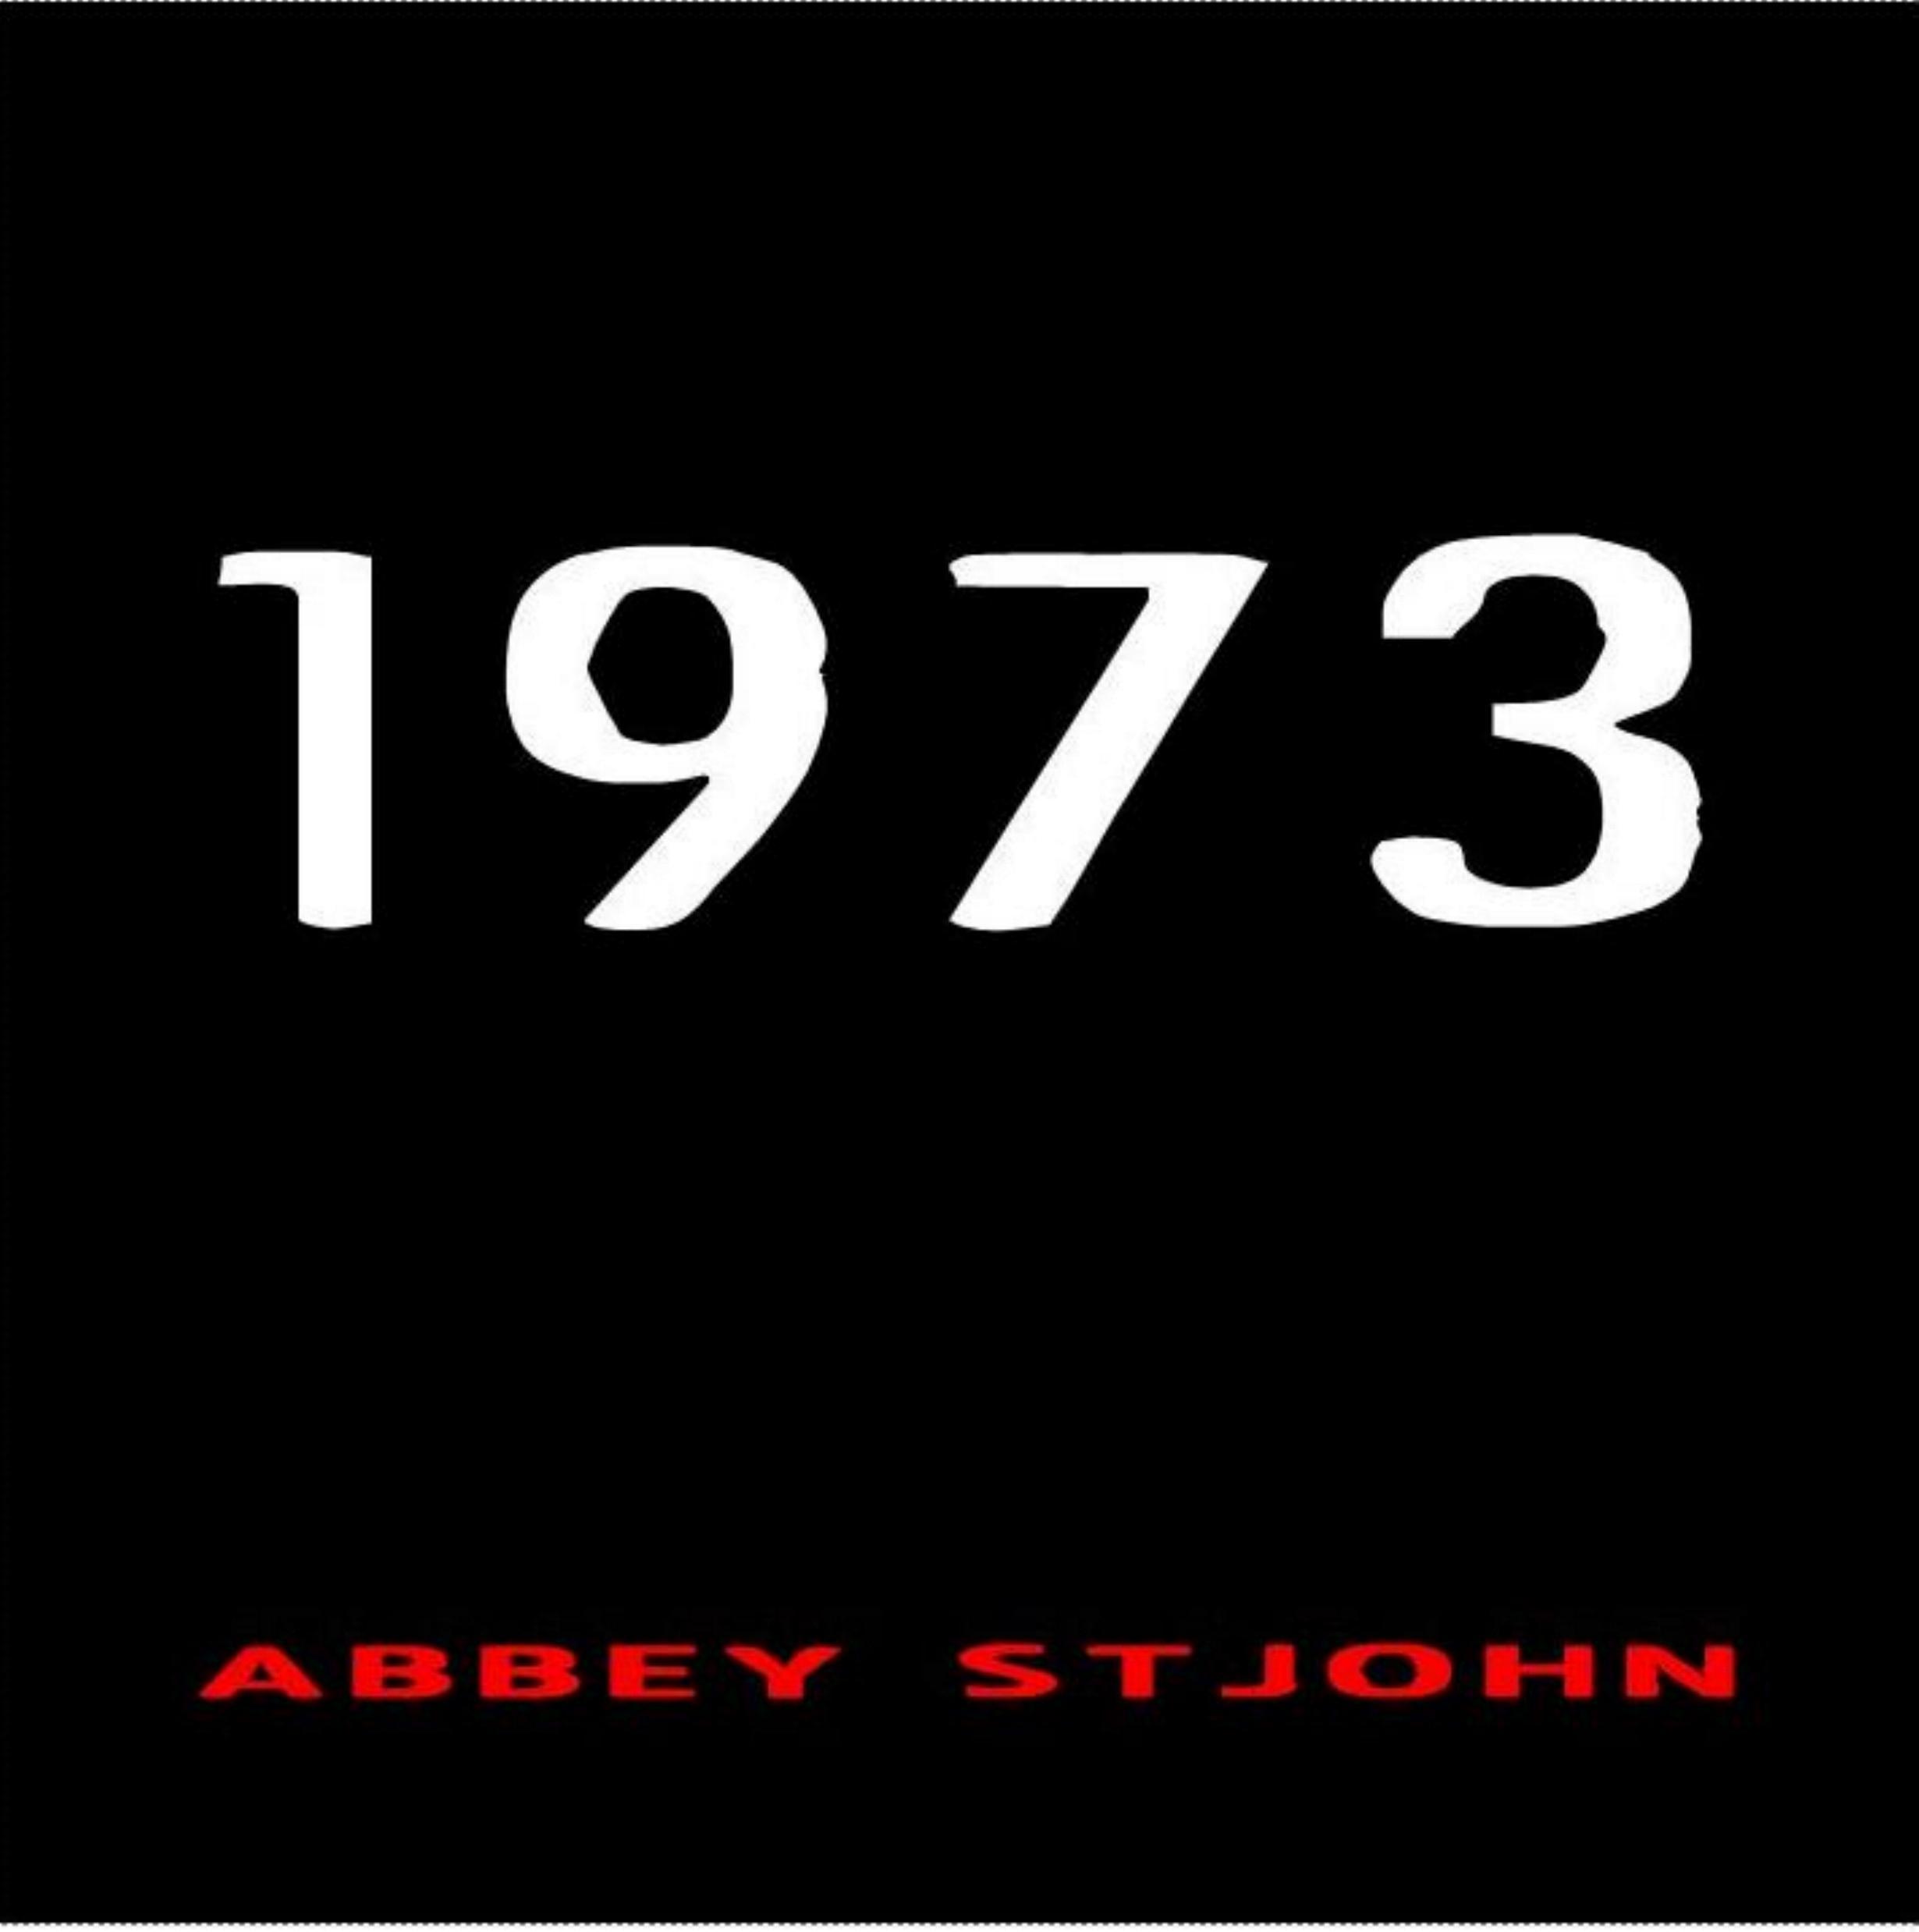 1973 Abbey Stjohn LP-Full color Gatefold with Lyrics and Photo sleeve